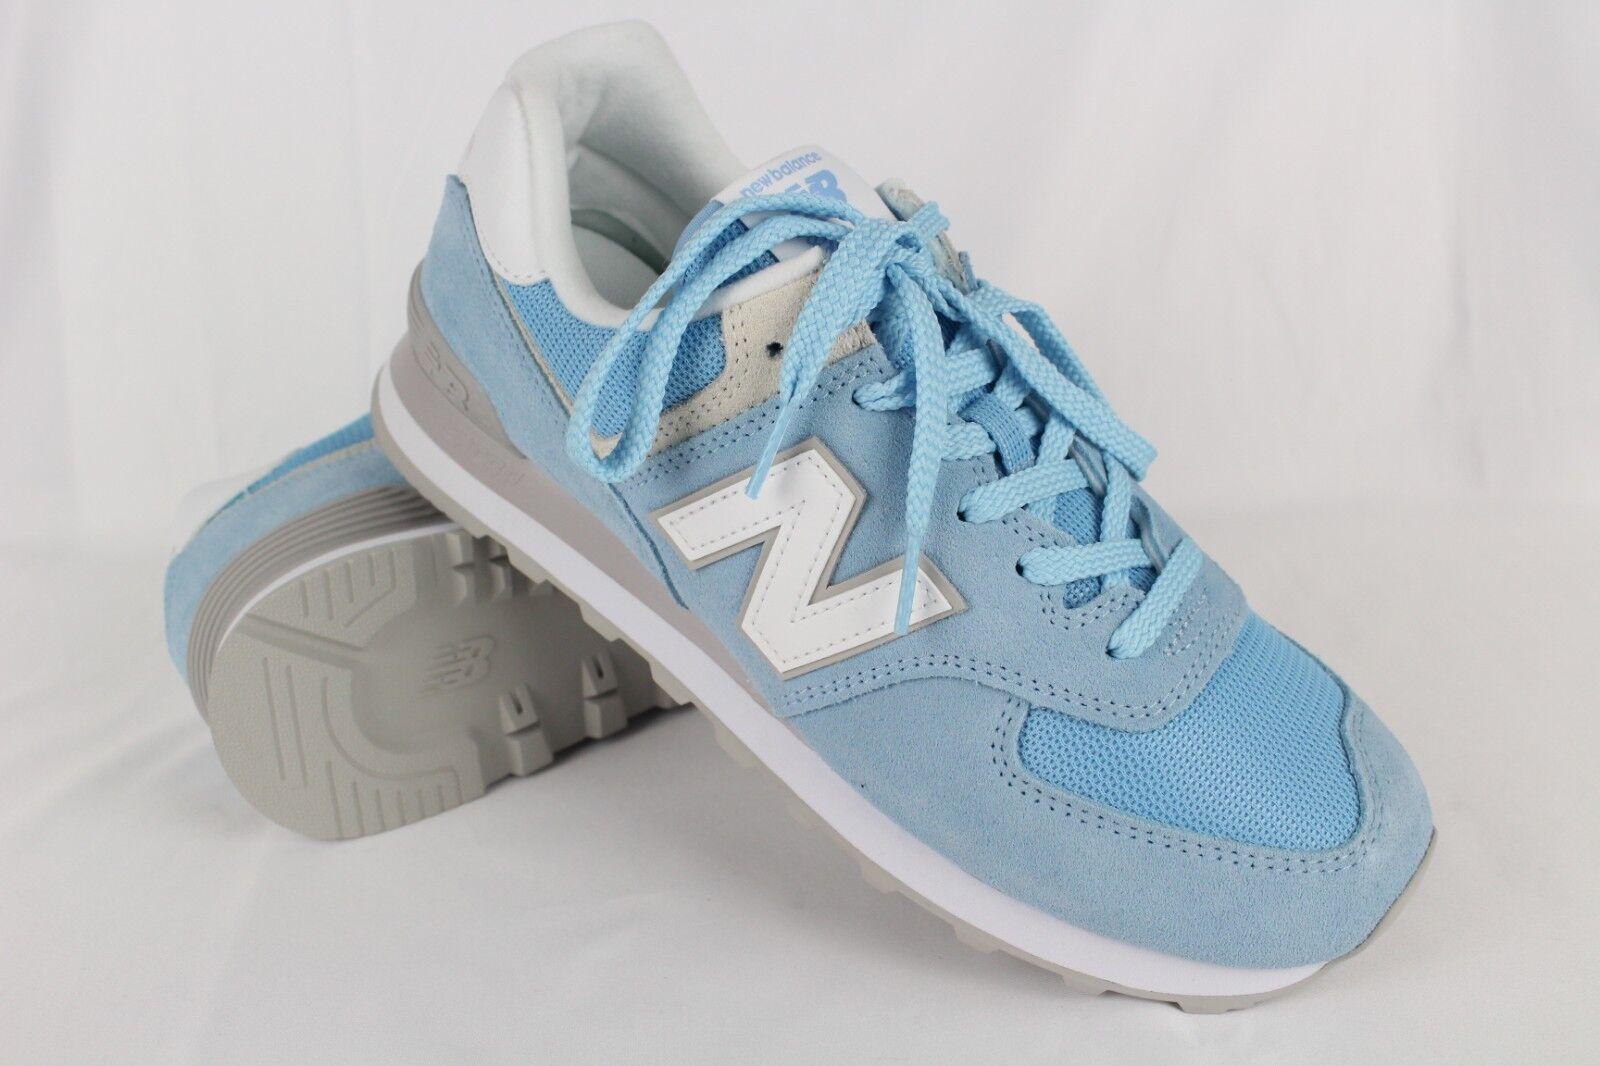 New Balance Women's 574 Classics Running Sneakers Size 10B Sky Blue WL574ESB